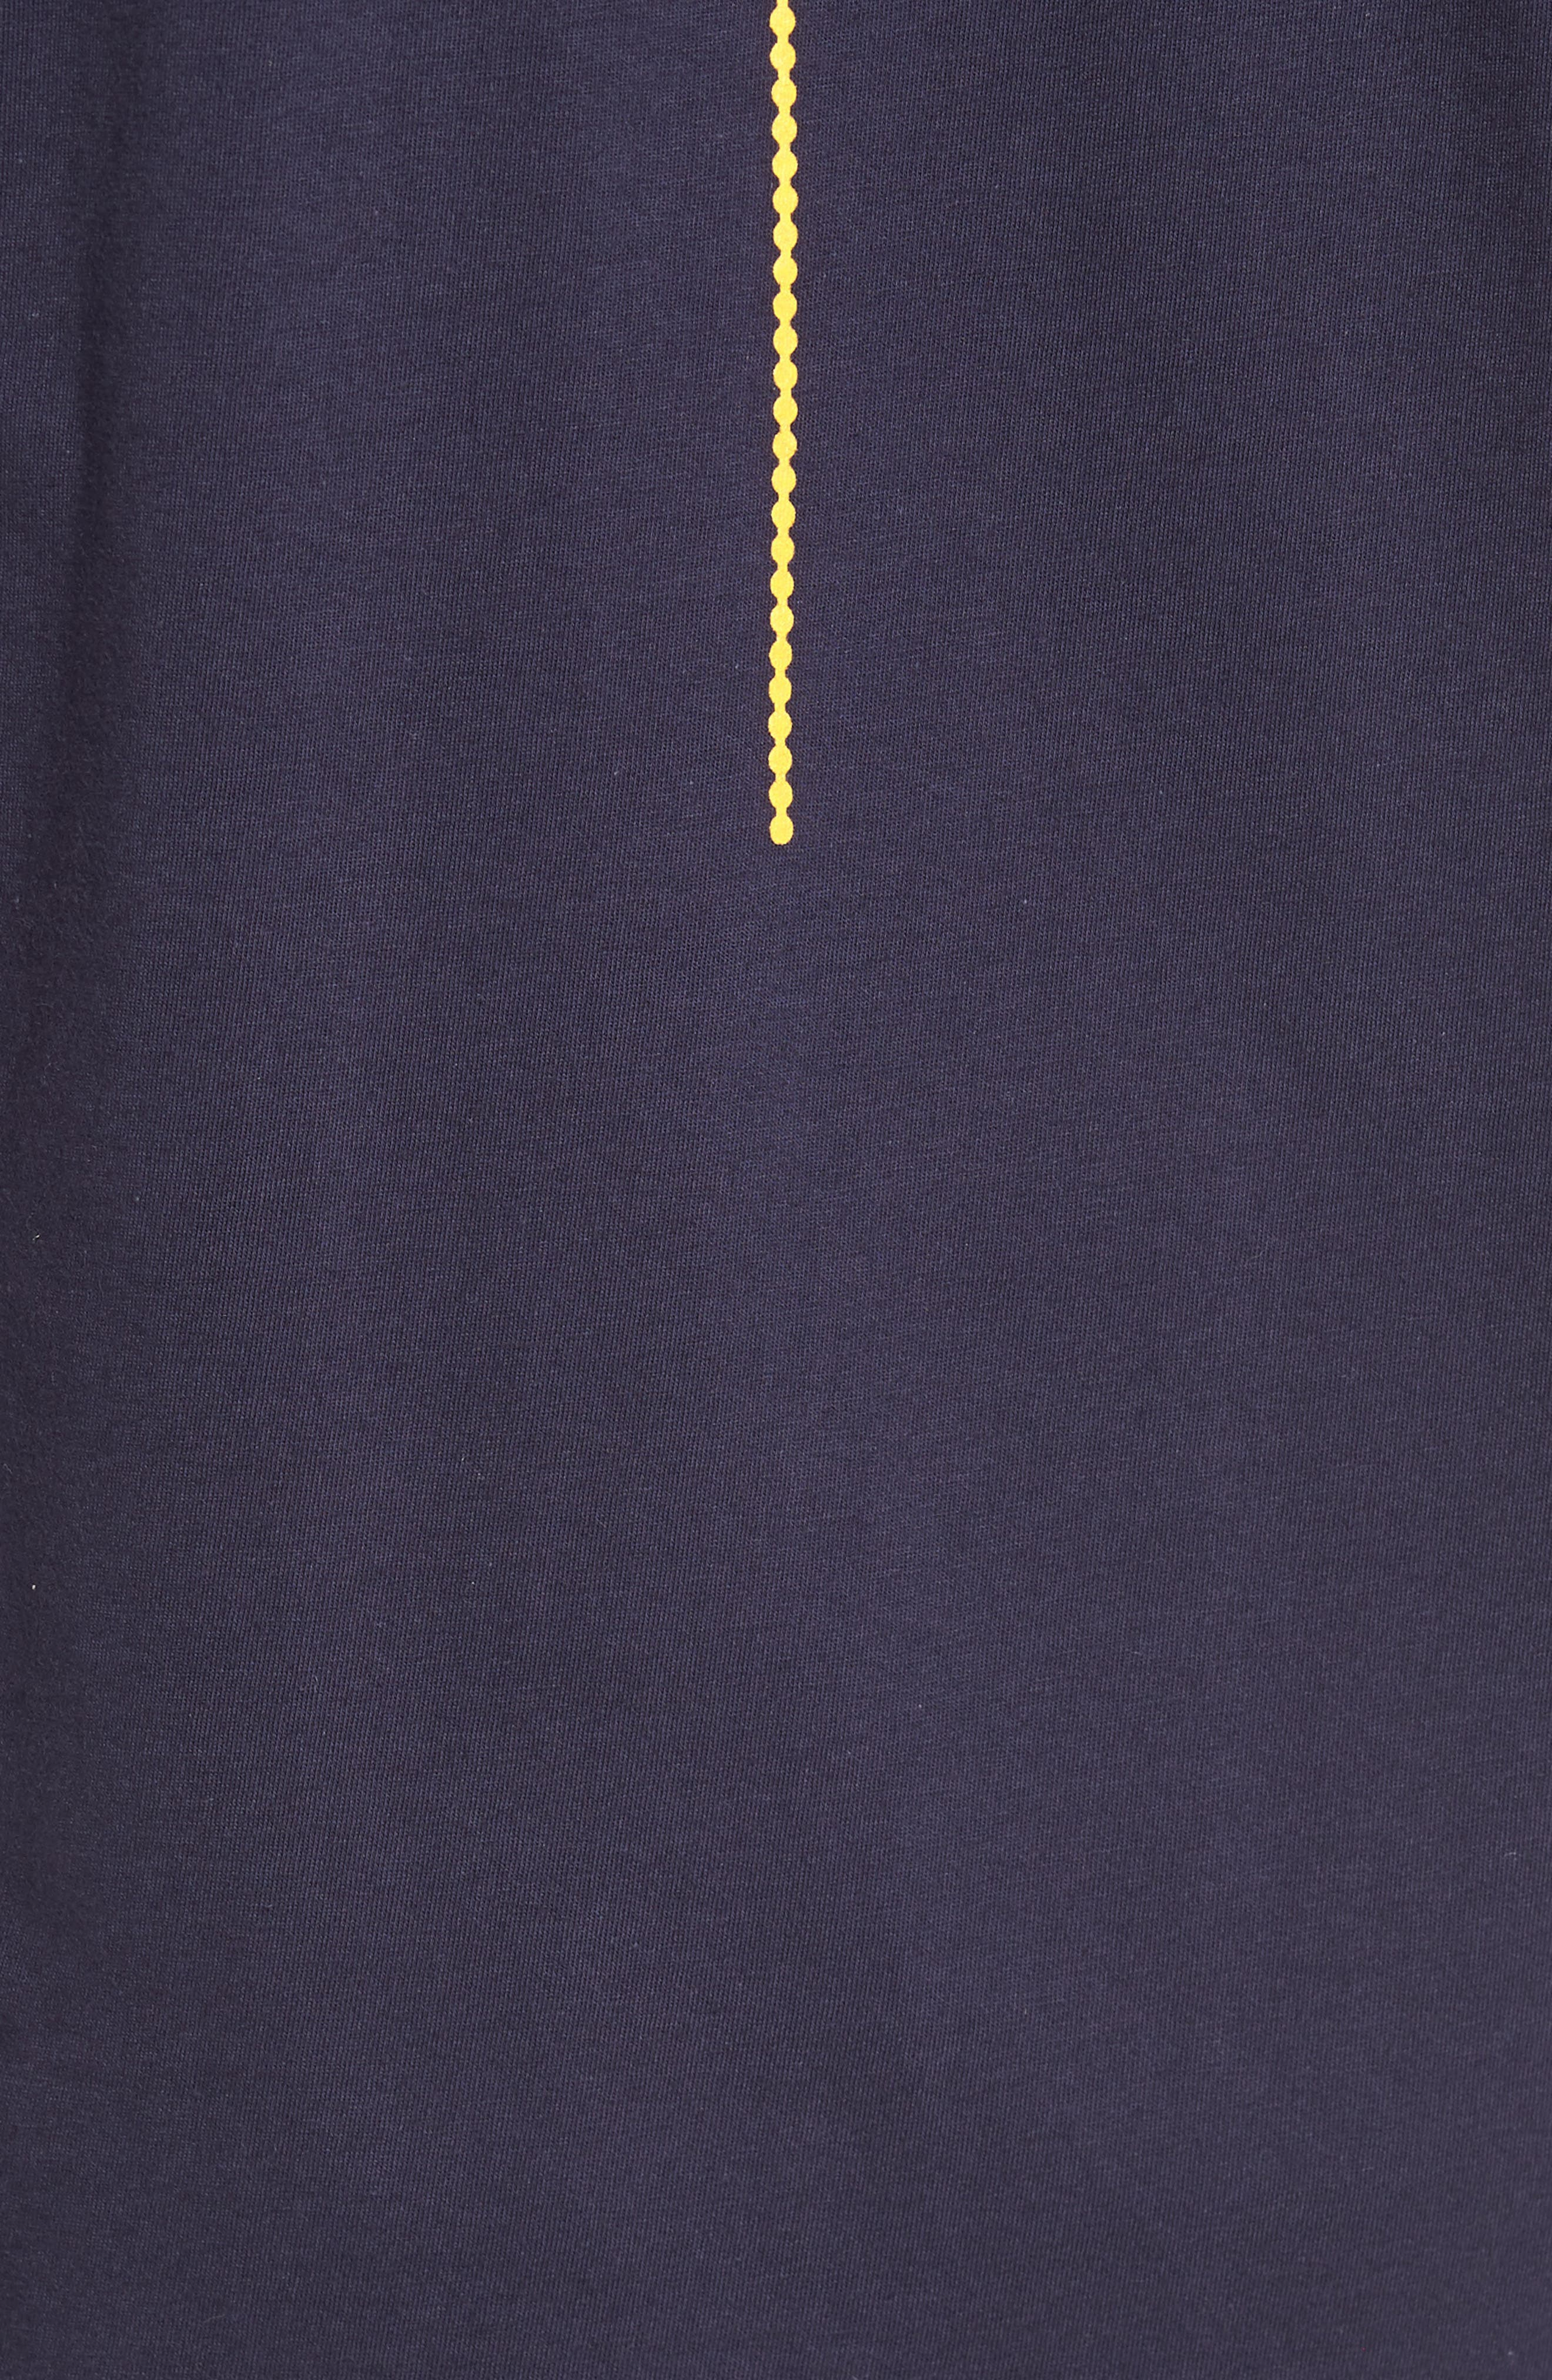 Keeping Seatown Lit T-Shirt,                             Alternate thumbnail 5, color,                             Navy